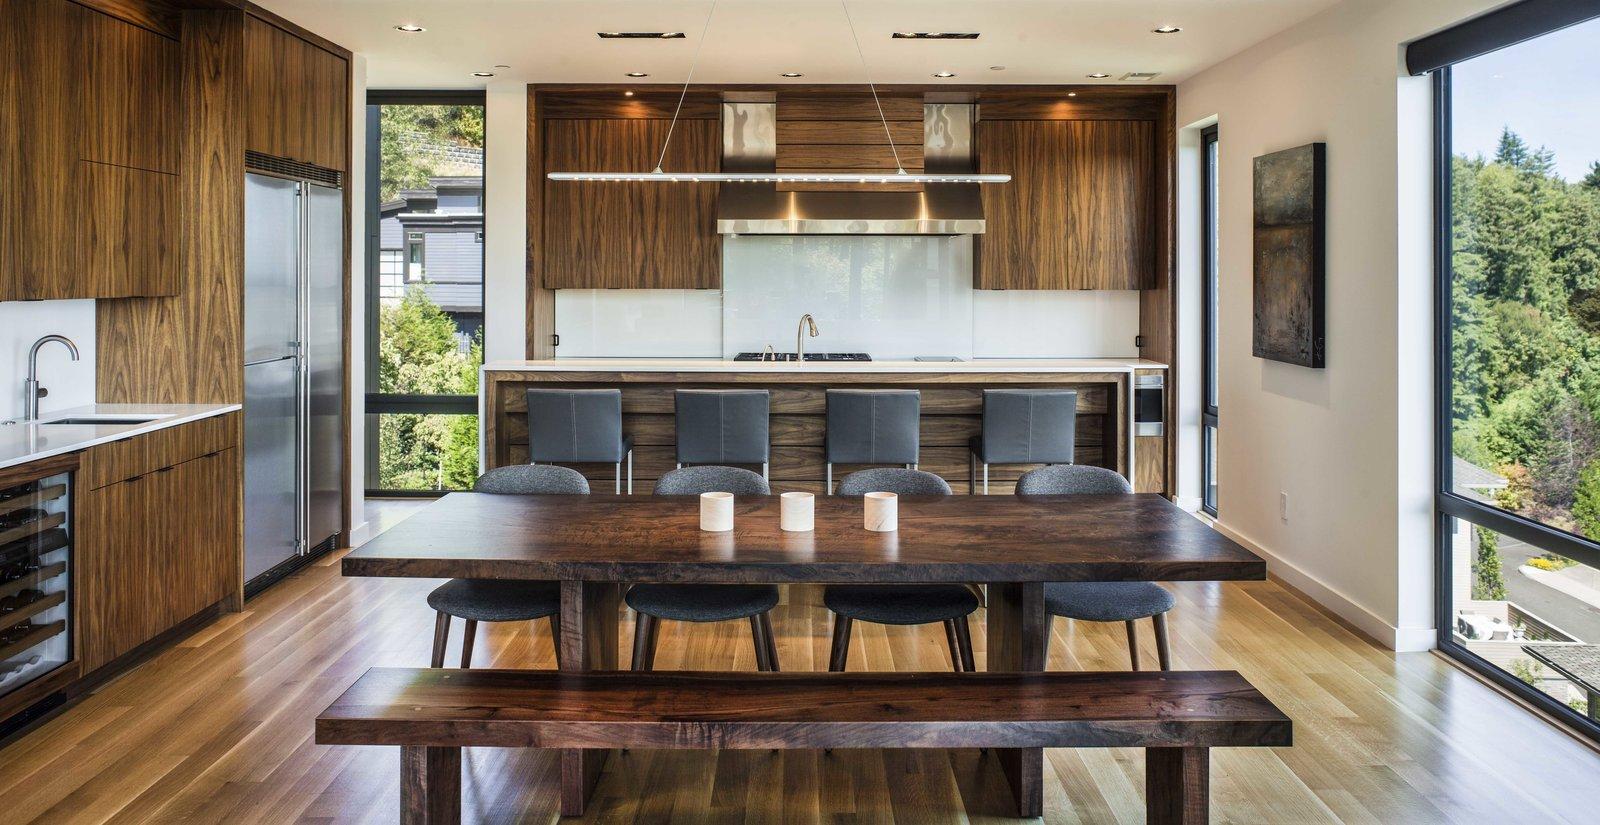 Kitchen, Wood Cabinet, Refrigerator, Medium Hardwood Floor, Ceiling Lighting, Pendant Lighting, Undermount Sink, and Range Kitchen  Music Box Residence by Scott | Edwards Architecture